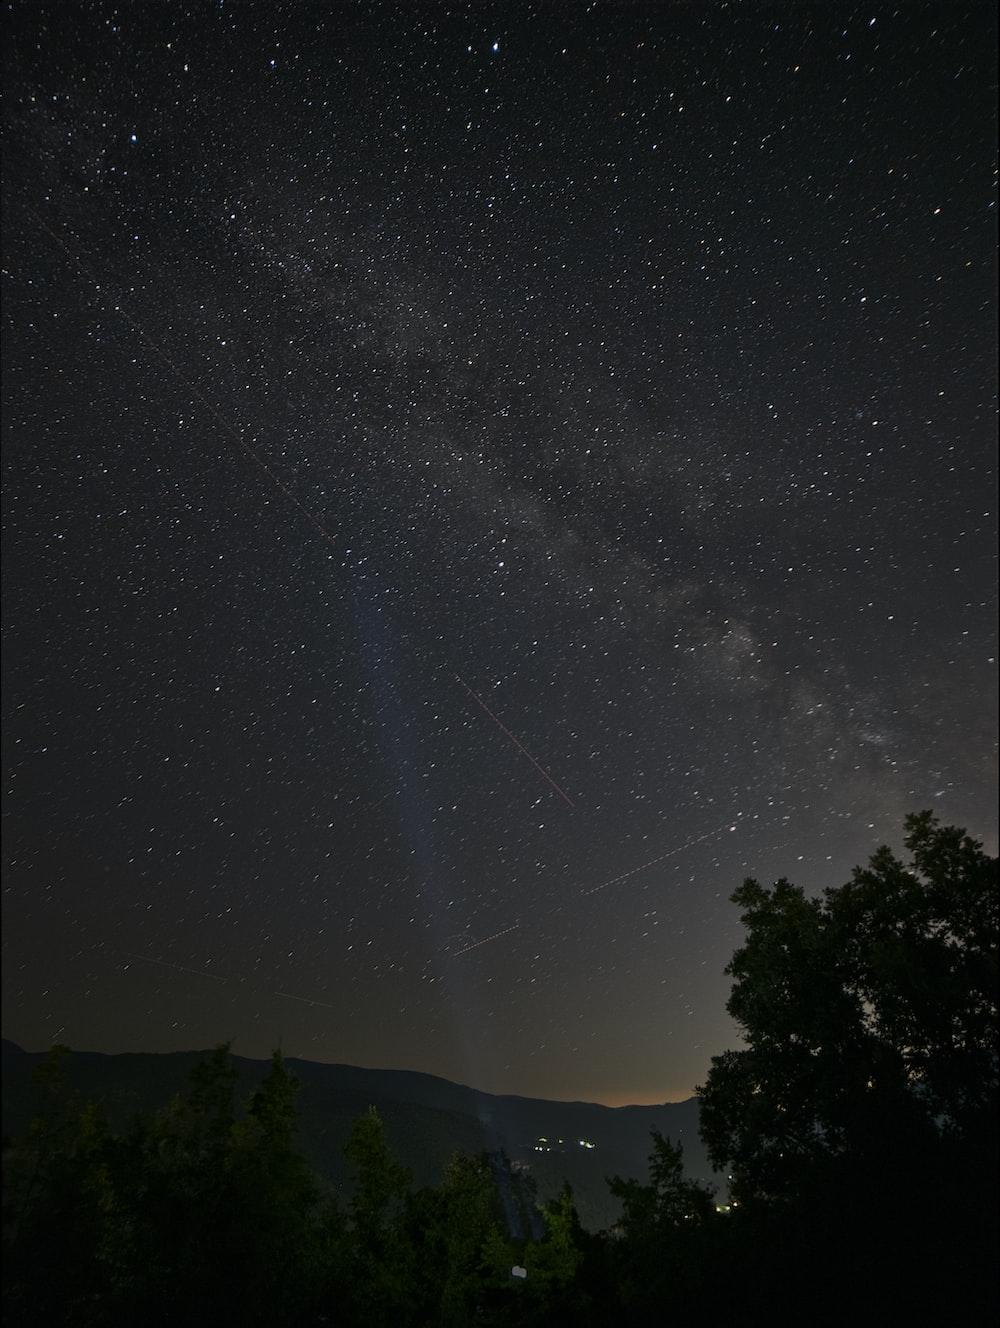 photo of milky way at night